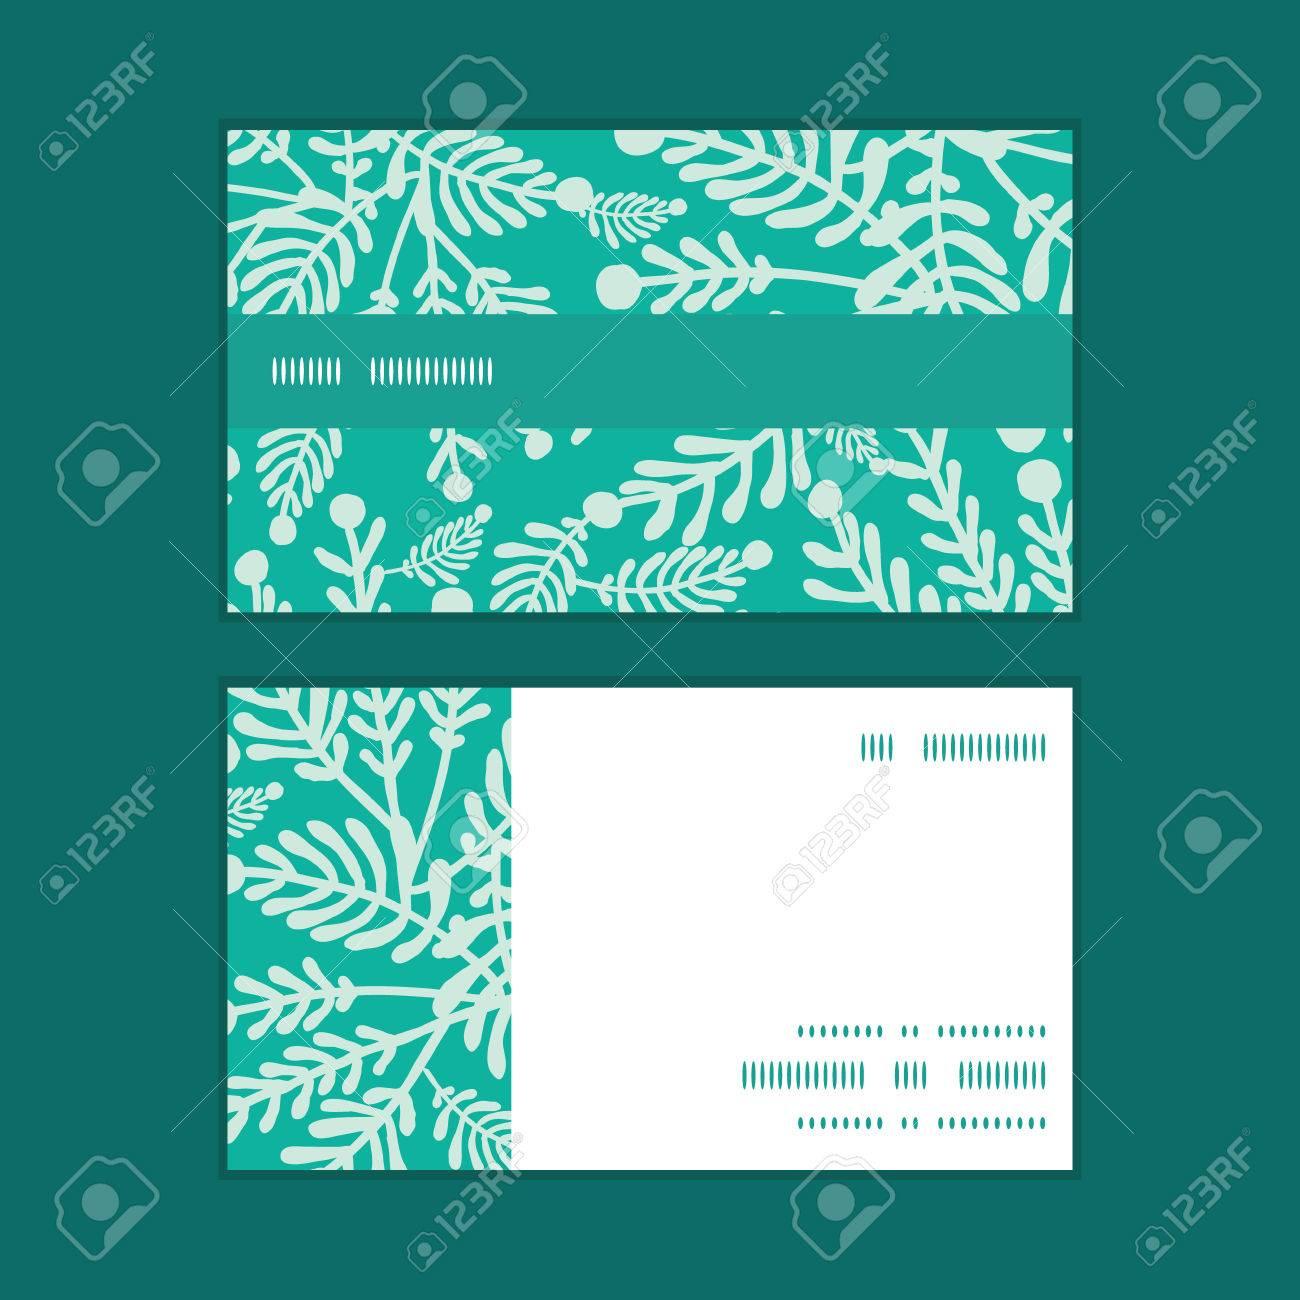 Vector Meraude Plantes Vertes Bande Horizontale Motif Dencadrement